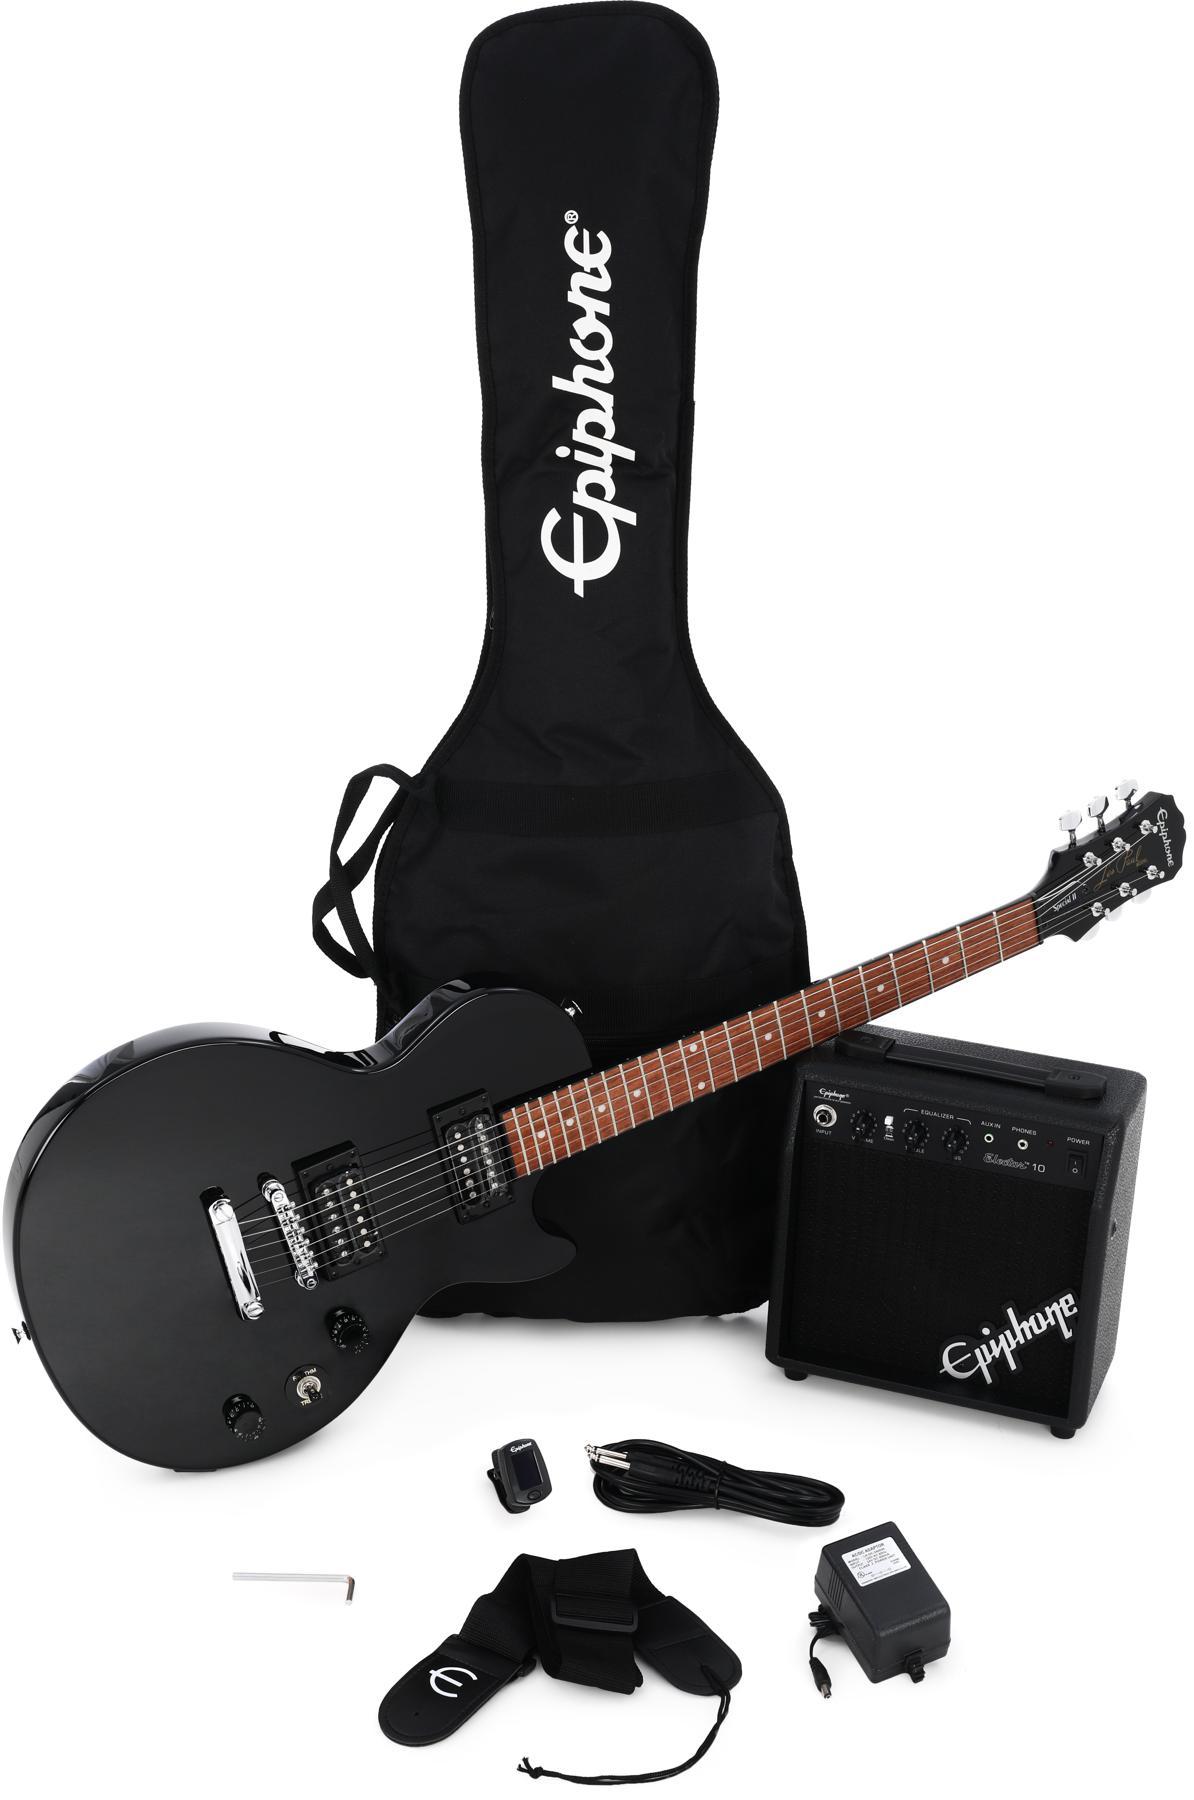 1. Epiphone Les Paul Electric Guitar Player Pack